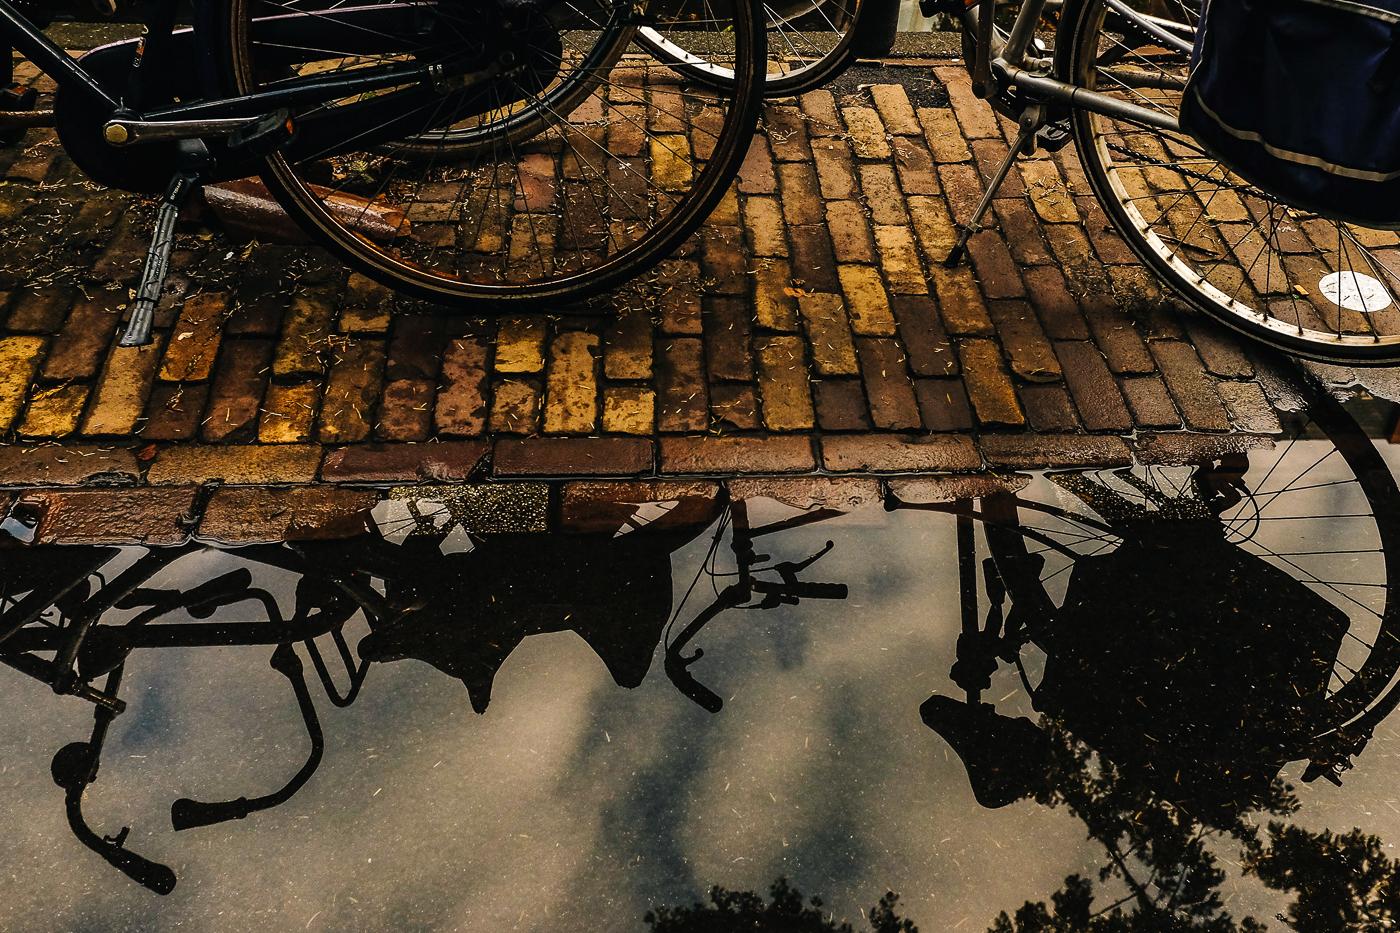 hb images - Amsterdam bike - 2